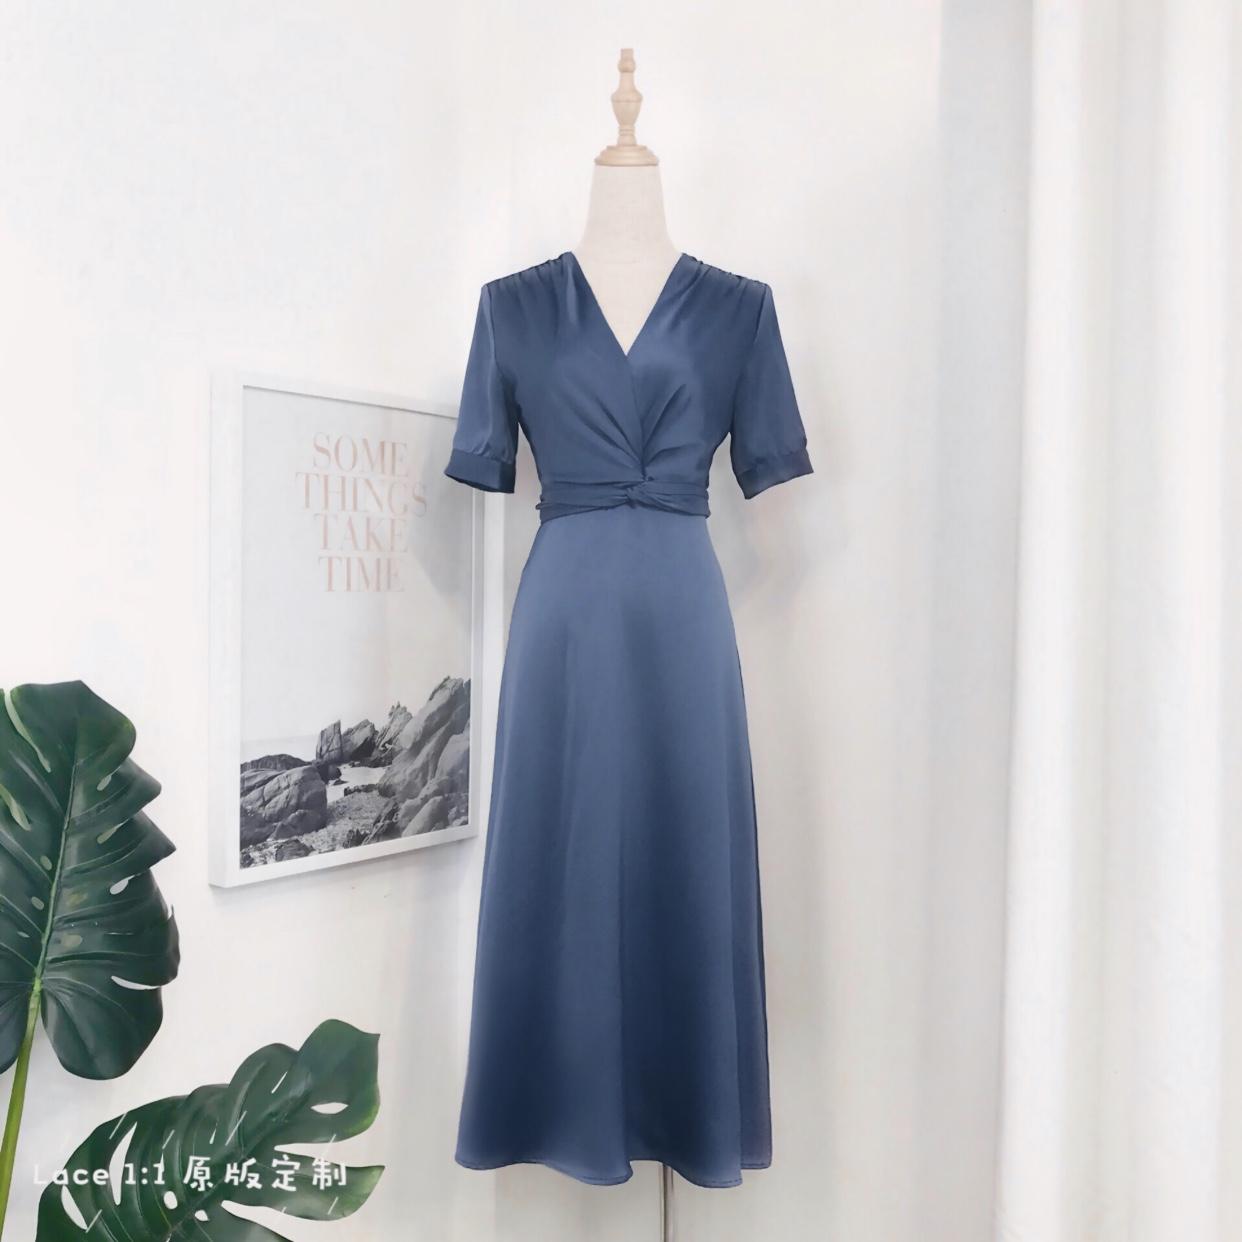 ALOHA STUDIO 露合制衣 法式v领缎面长裙短袖高腰气质扭结连衣裙